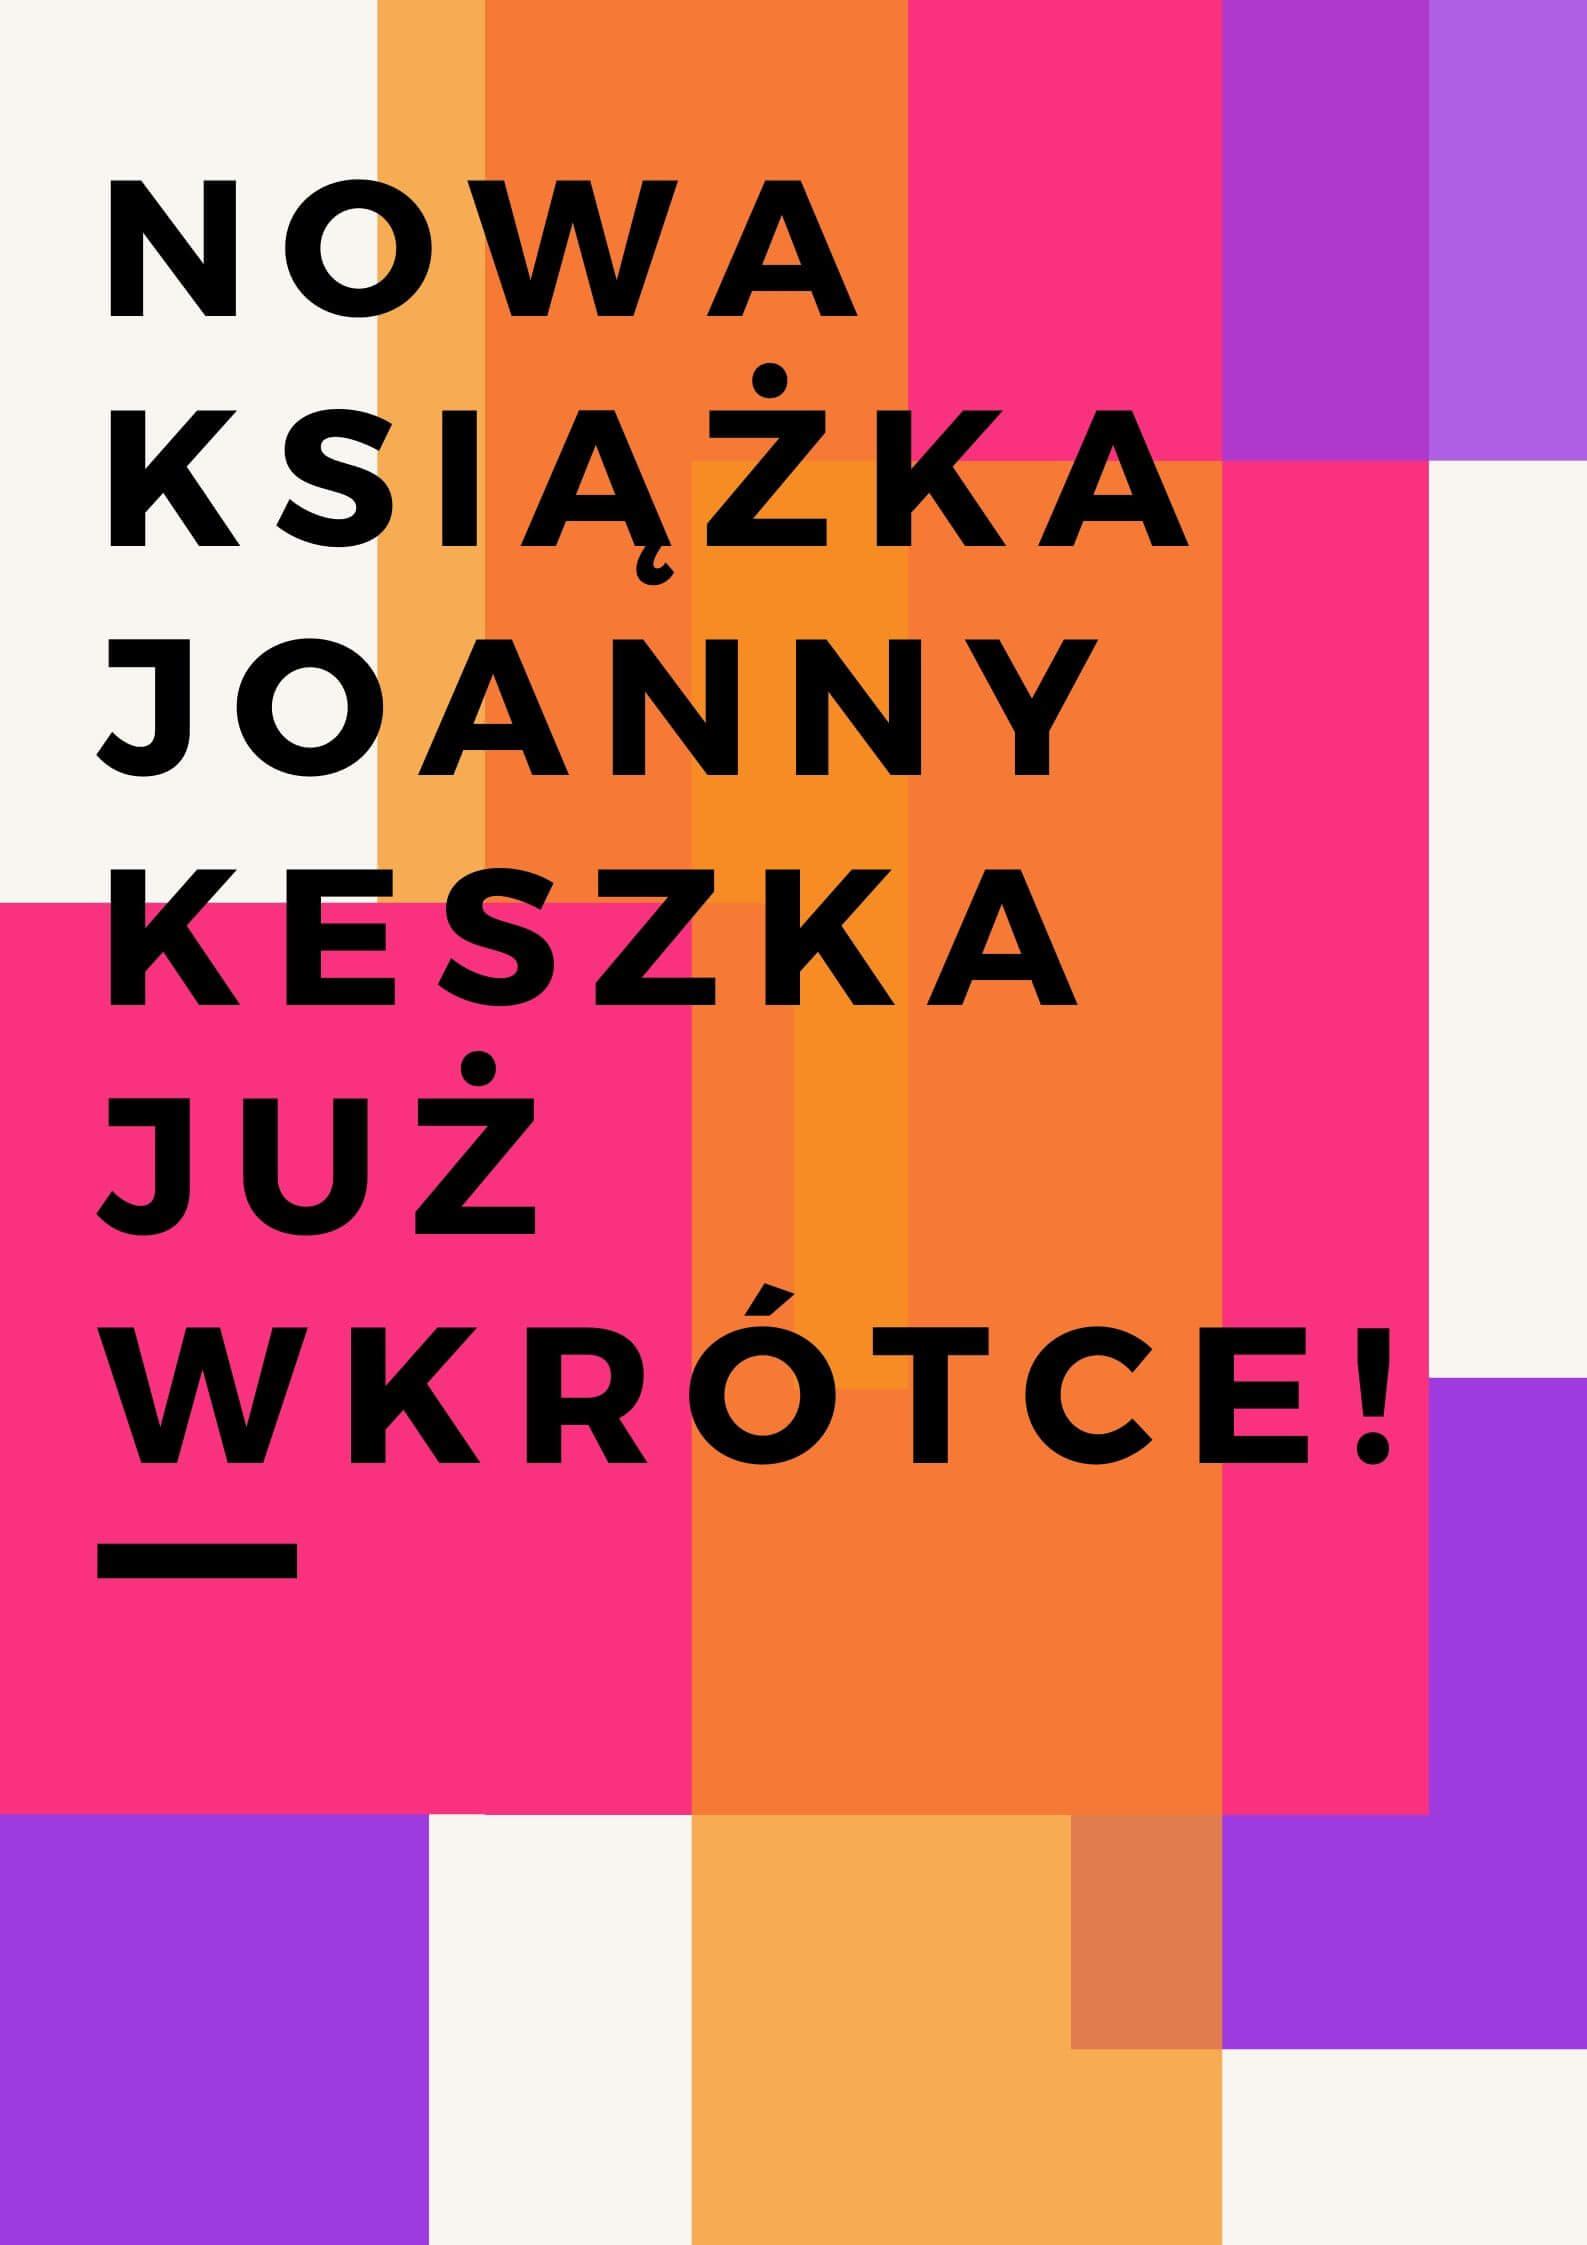 Nowa książka Joanny Keszka już wkrótce